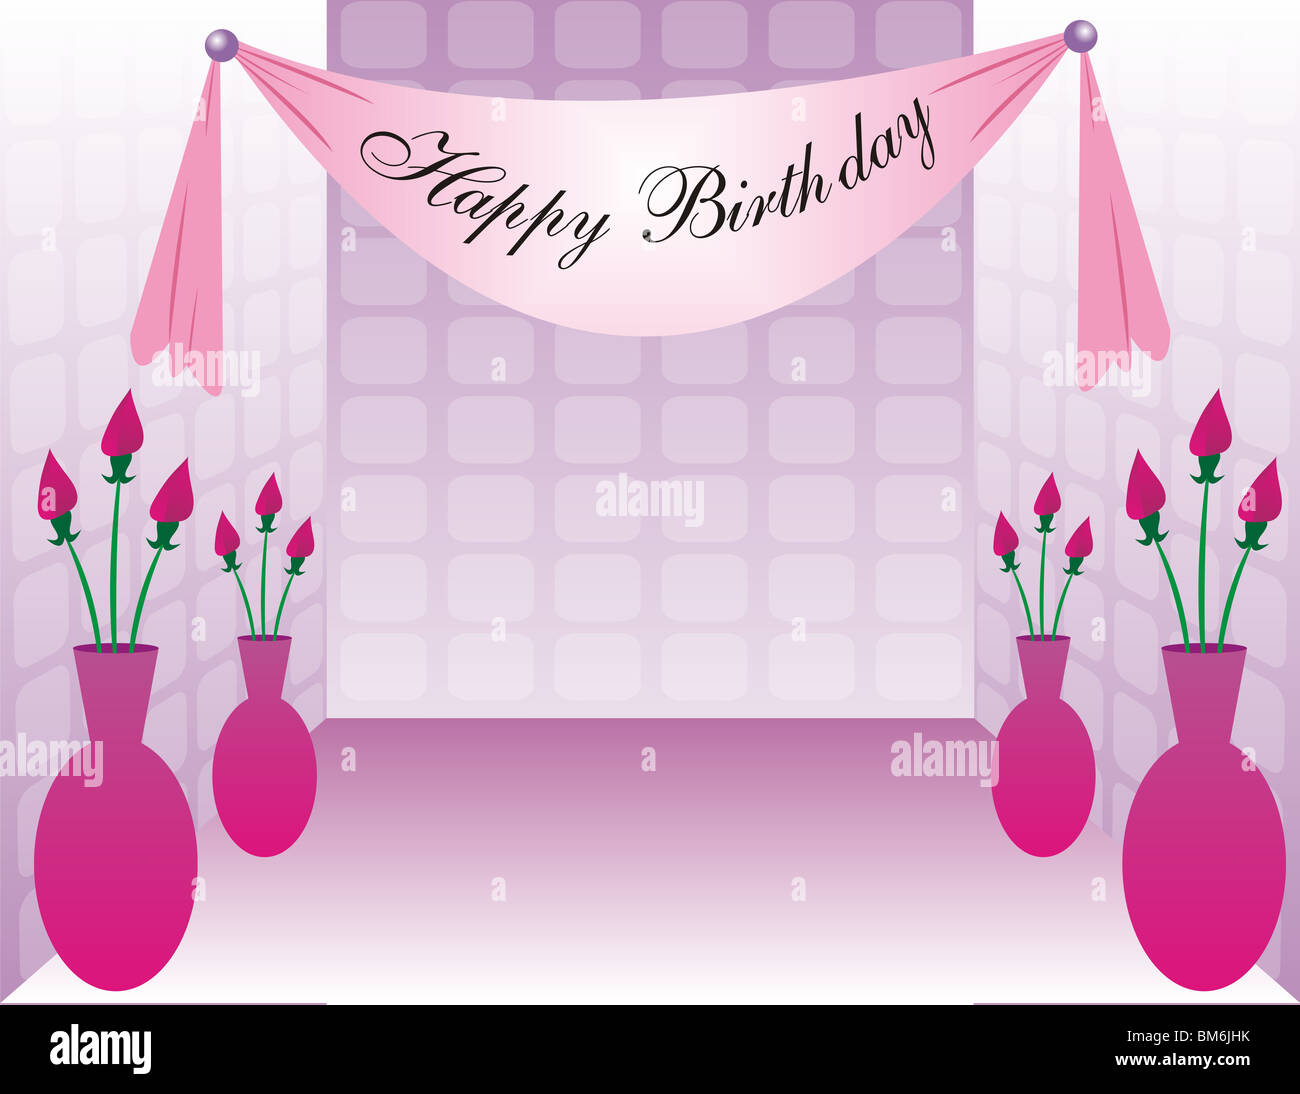 Sweet Sixteen Celebration background with a Happy Birthday